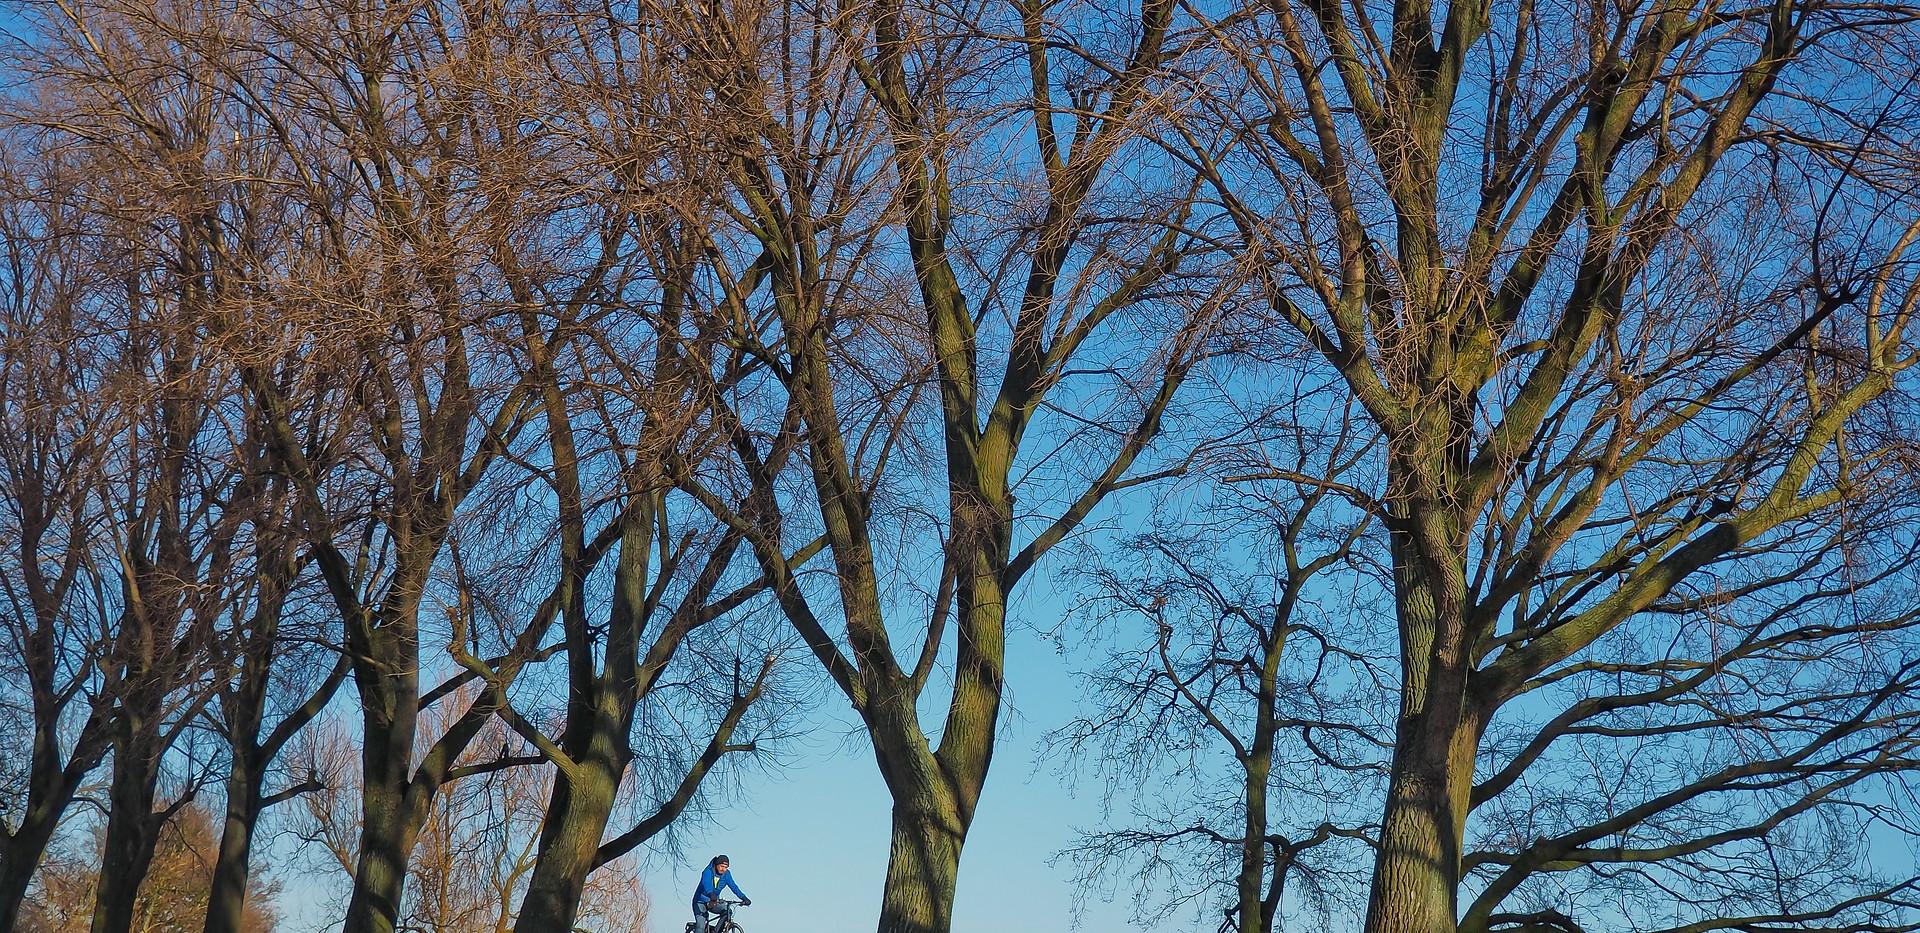 trees-3168329_1920.jpg